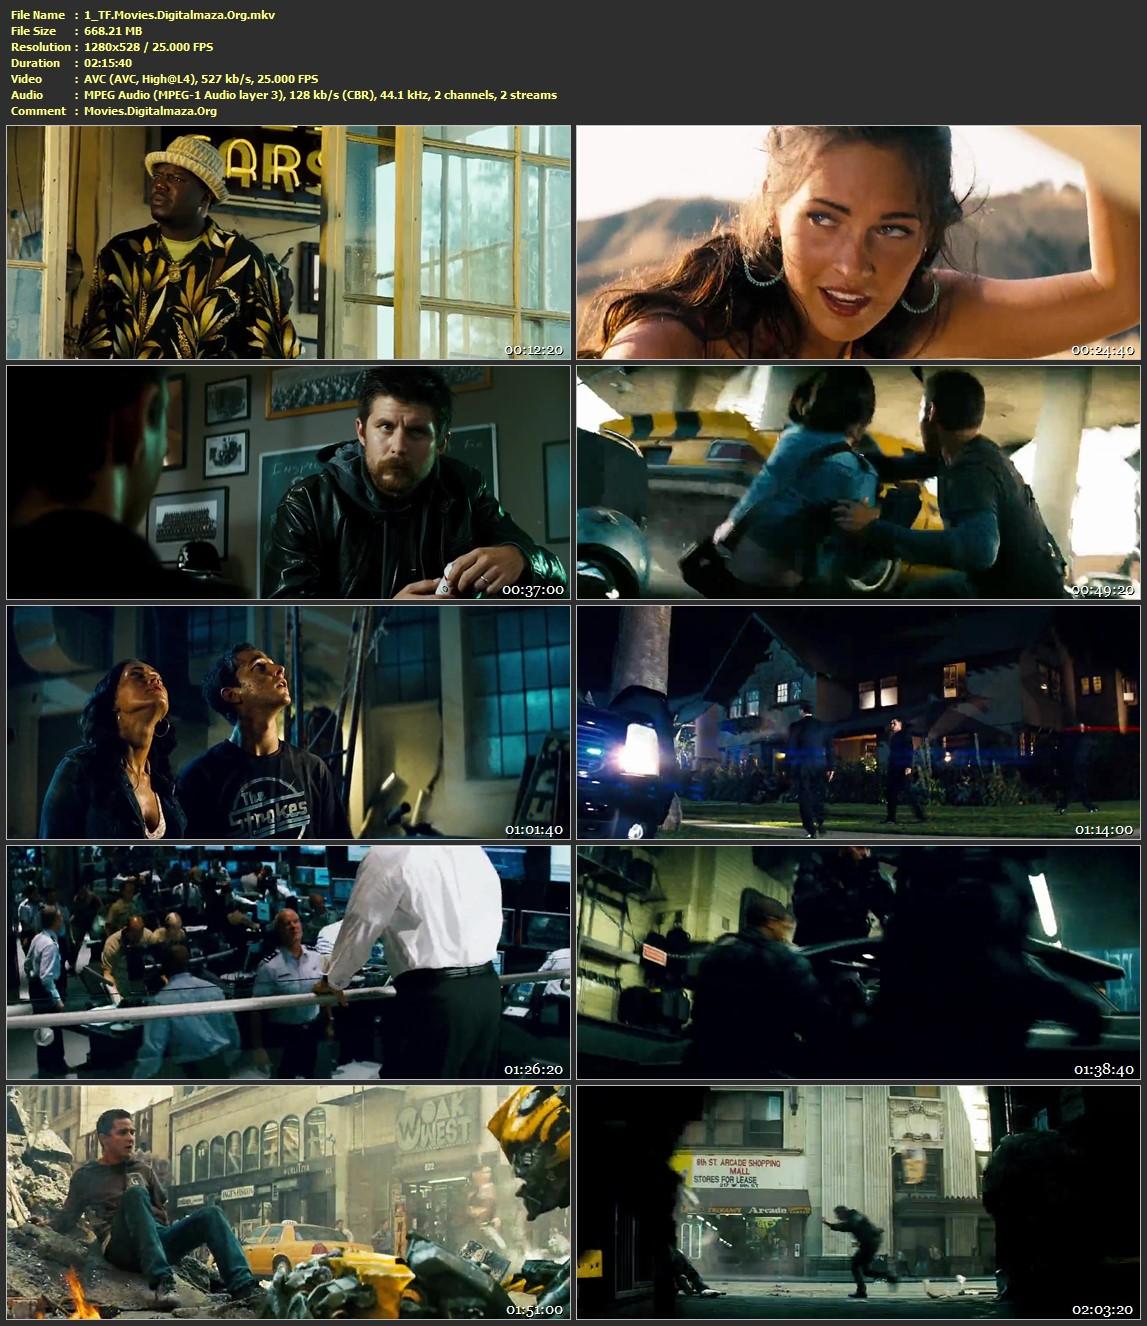 https://image.ibb.co/dCmuSc/1_TF_Movies_Digitalmaza_Org_mkv.jpg